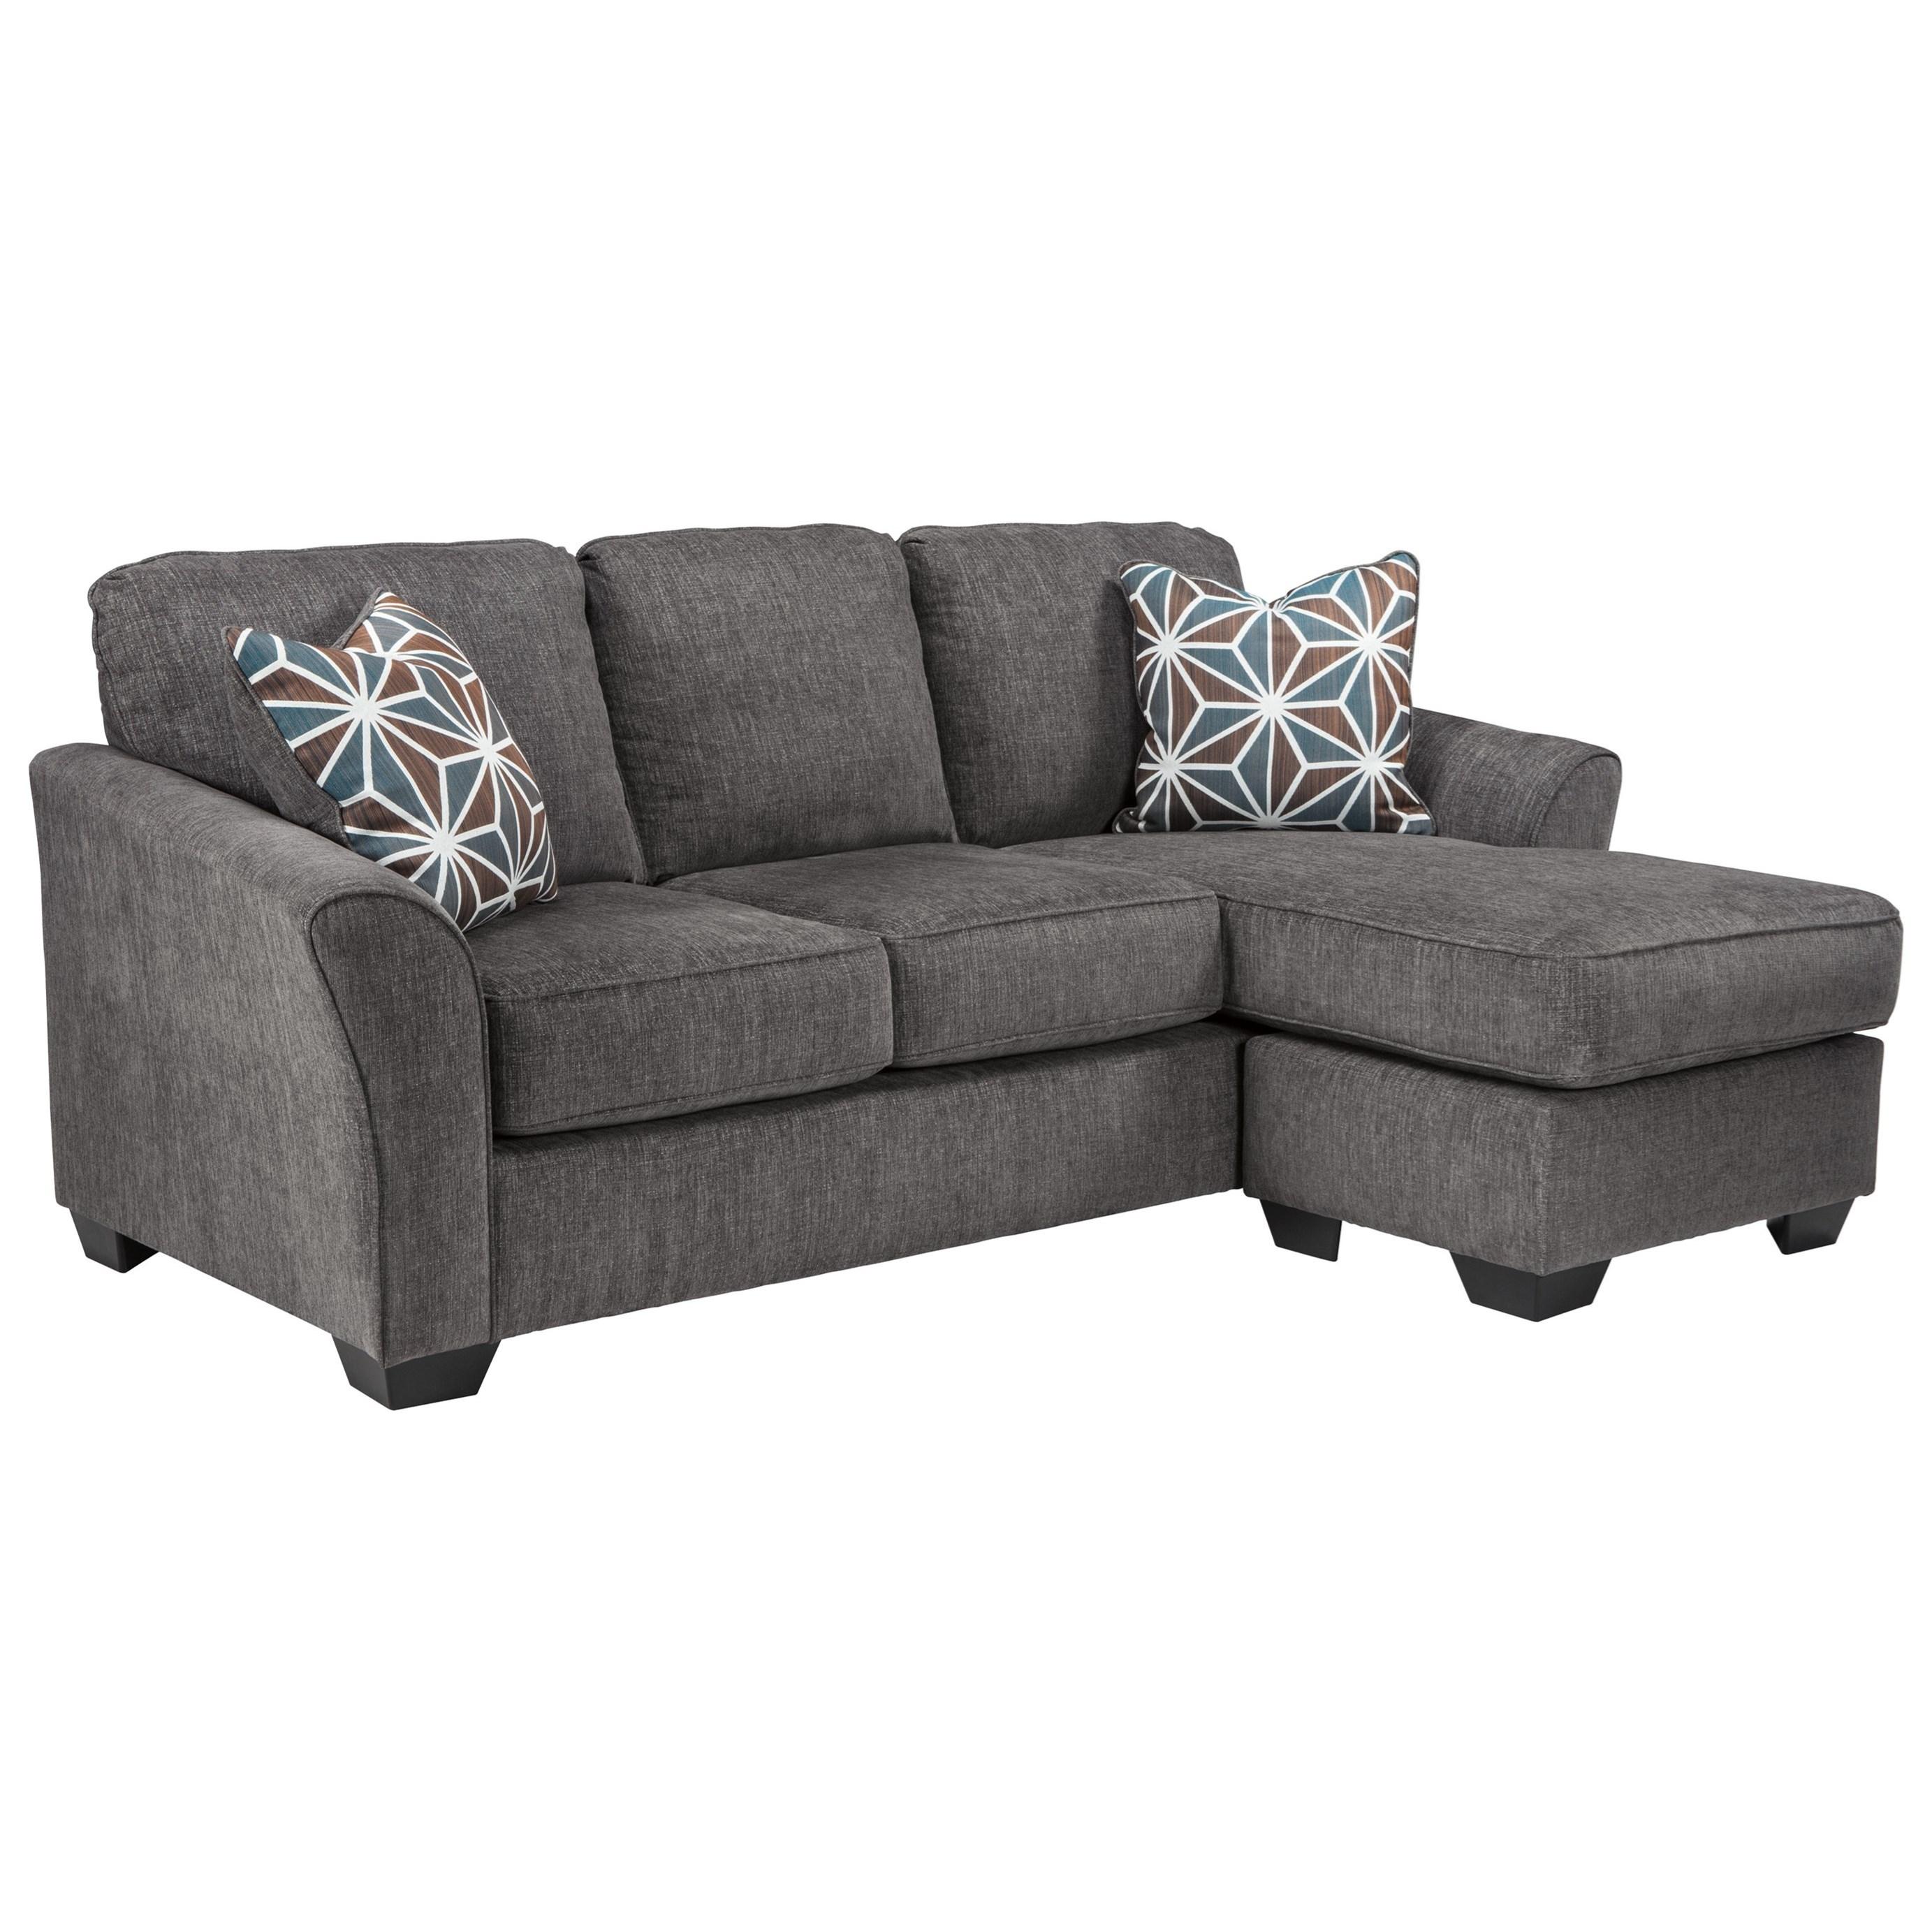 Casual Contemporary Sofa Chaise